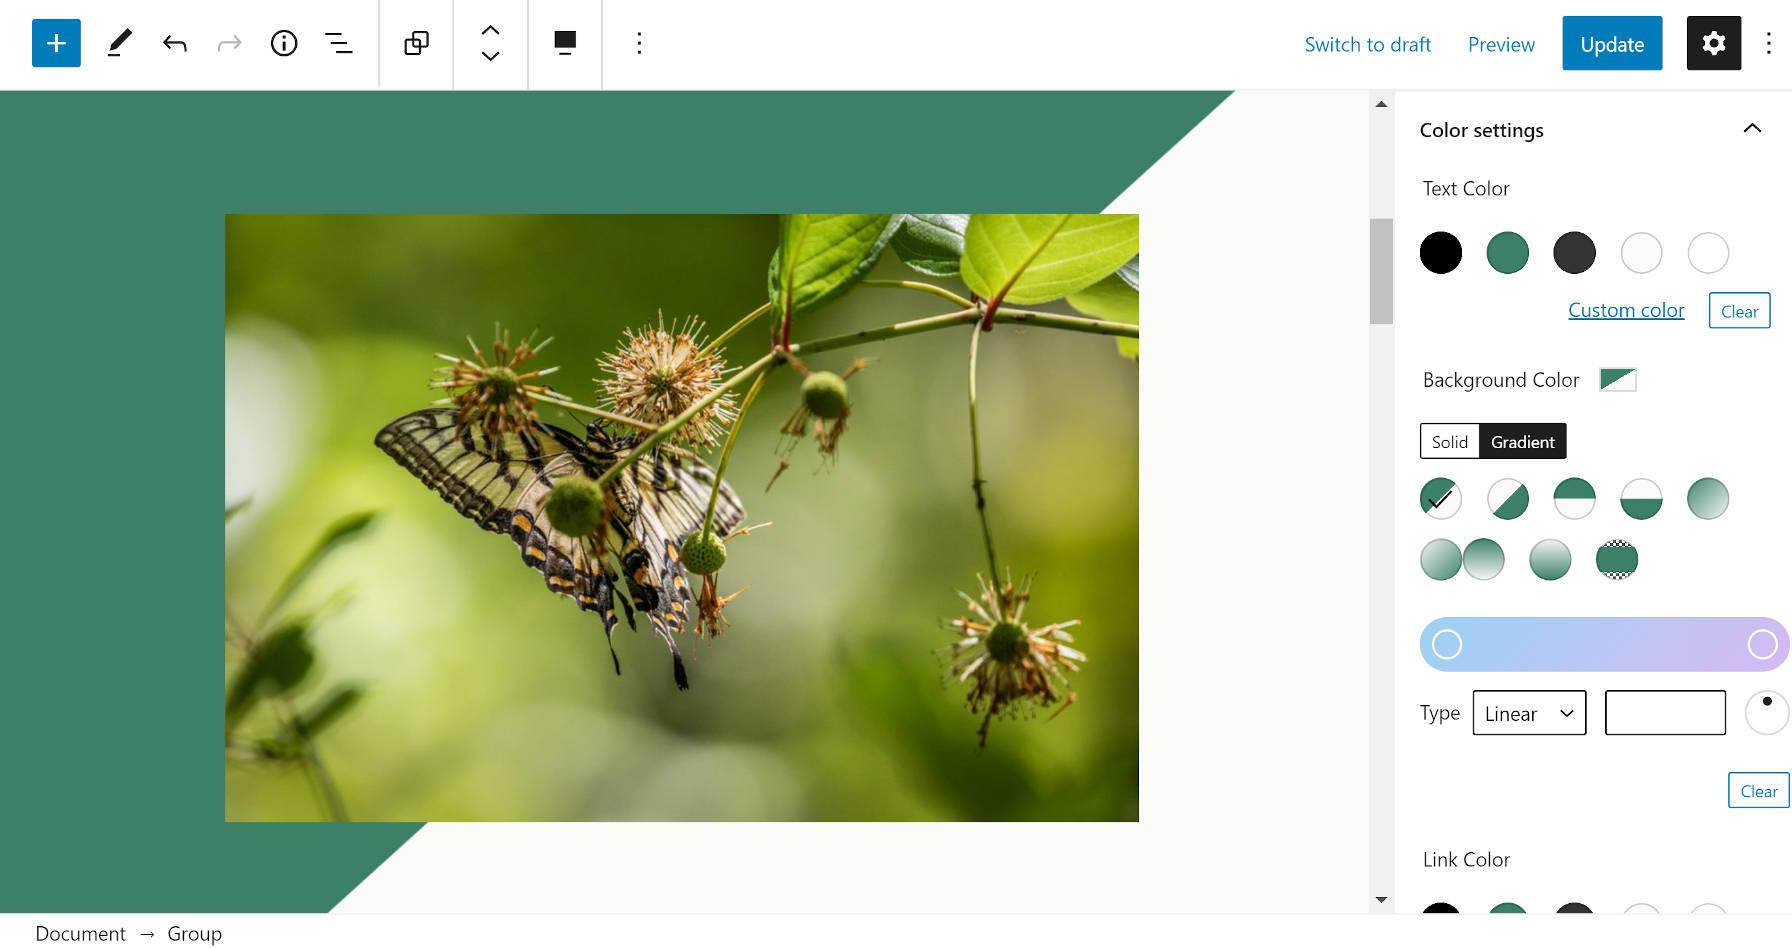 Explore-seedlet-automattics-block-first-wordpress-theme-1探索Seedlet,Automattic的Block-first WordPress主题